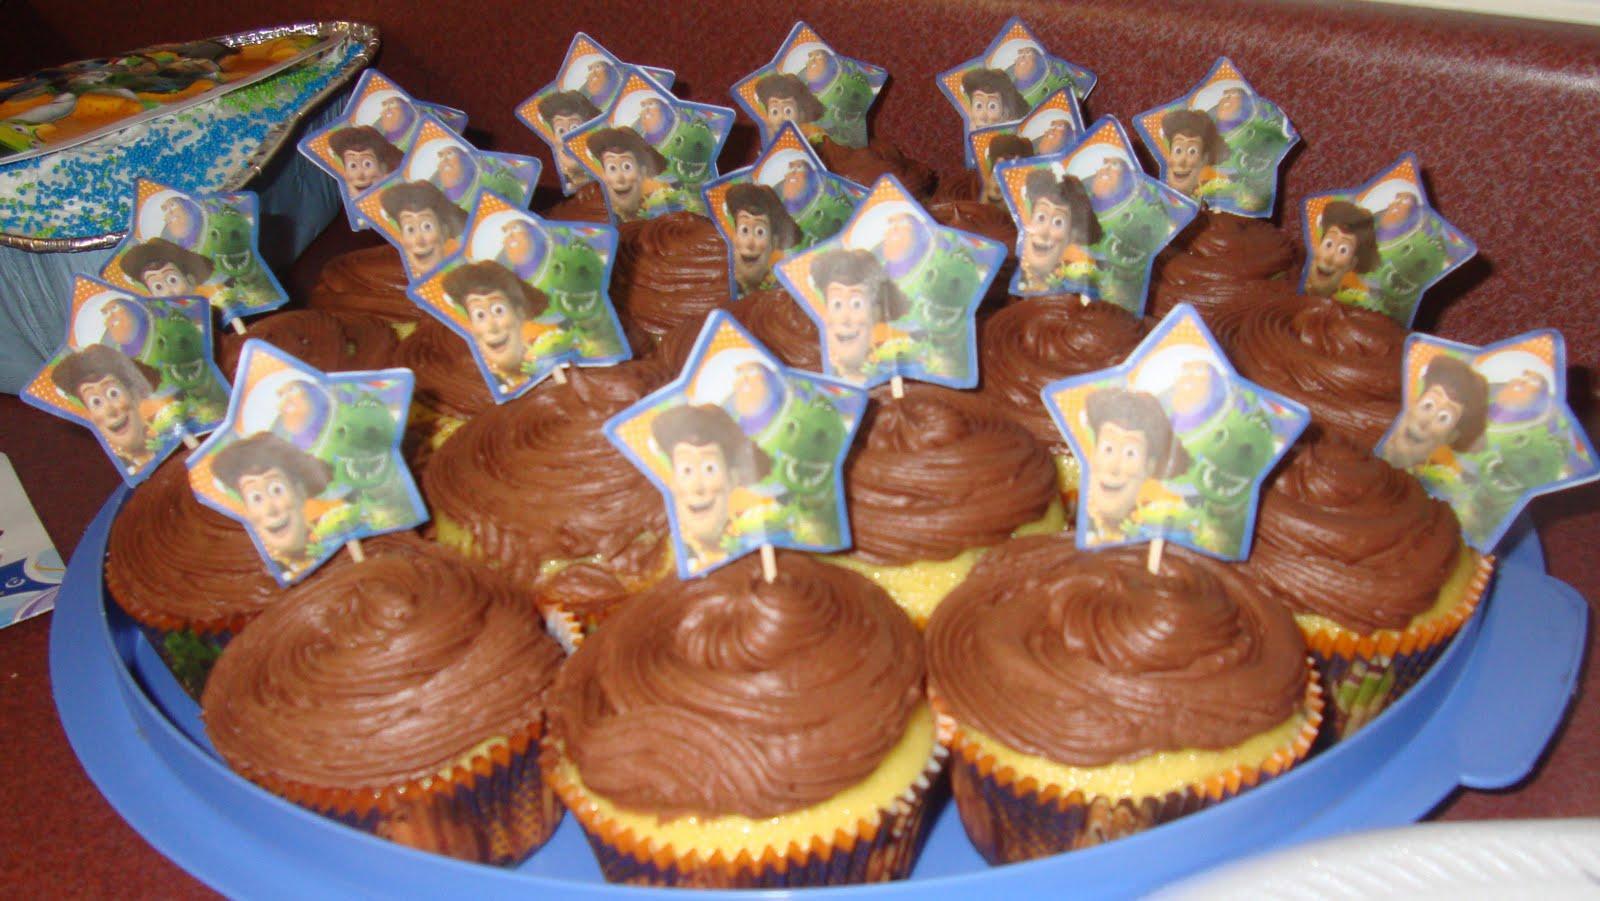 Tana S Blog Walmart Wedding Cakes